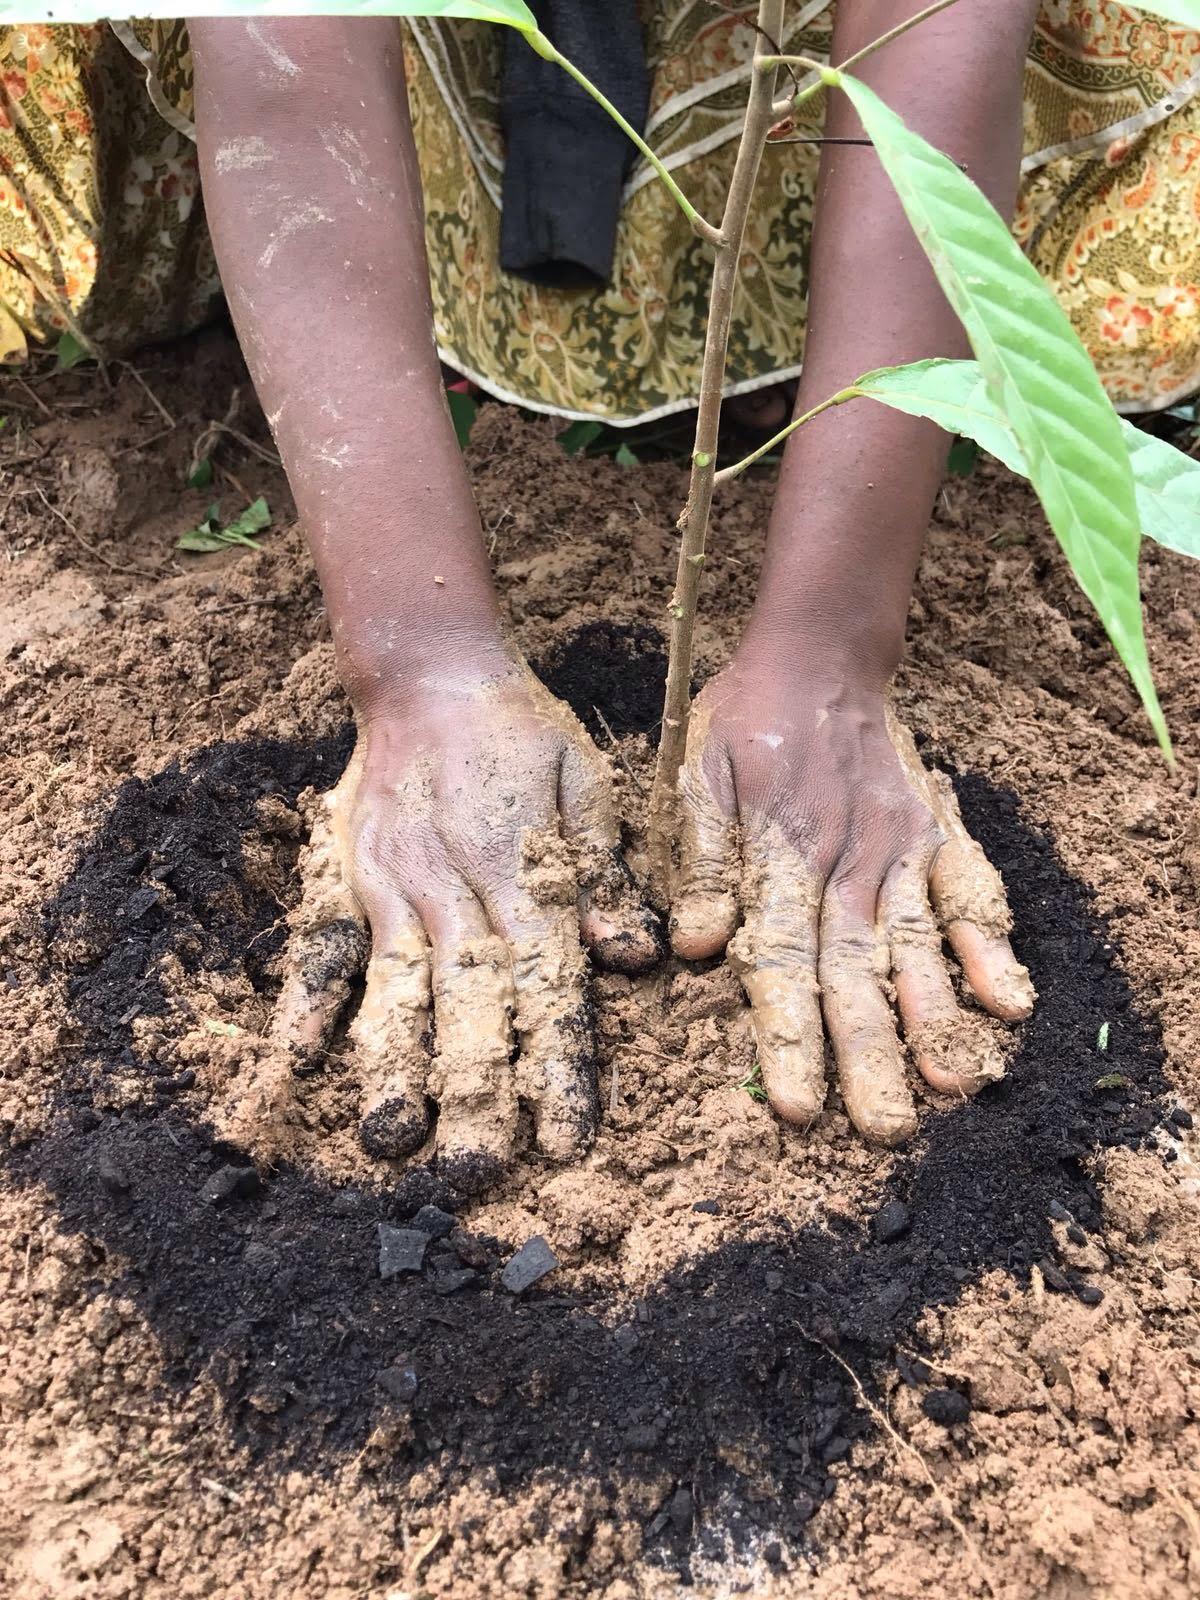 Sustainability, cocoa sustainability, sustainable cocoa, why is sustainability important, sustainability defined, sustainability movement